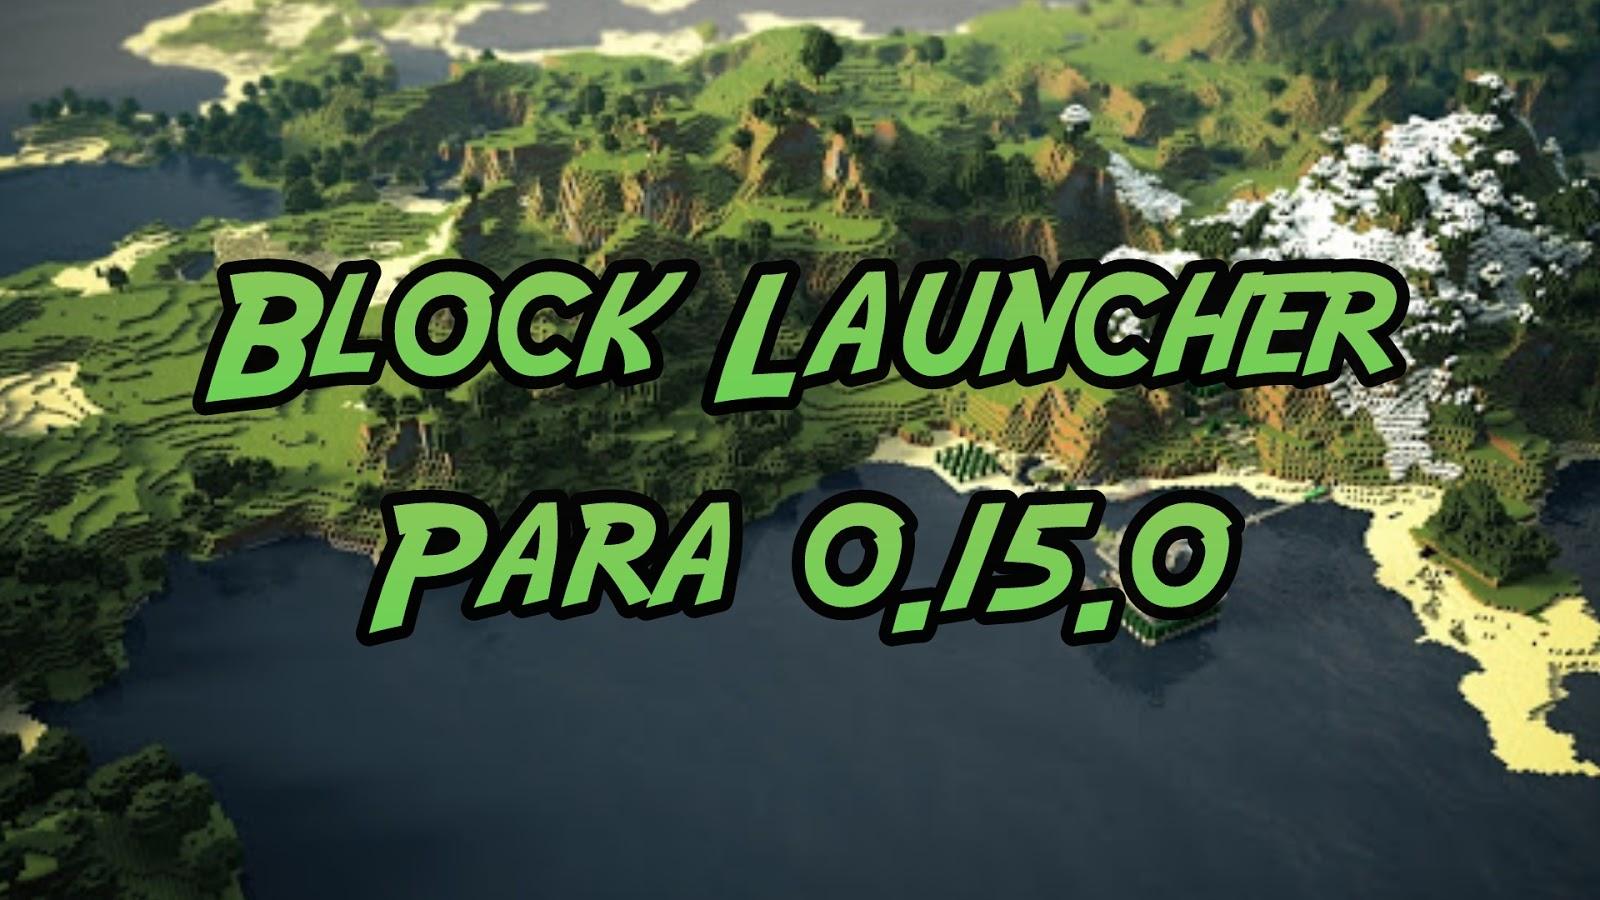 download blocklauncher pro 0.15.0 apk